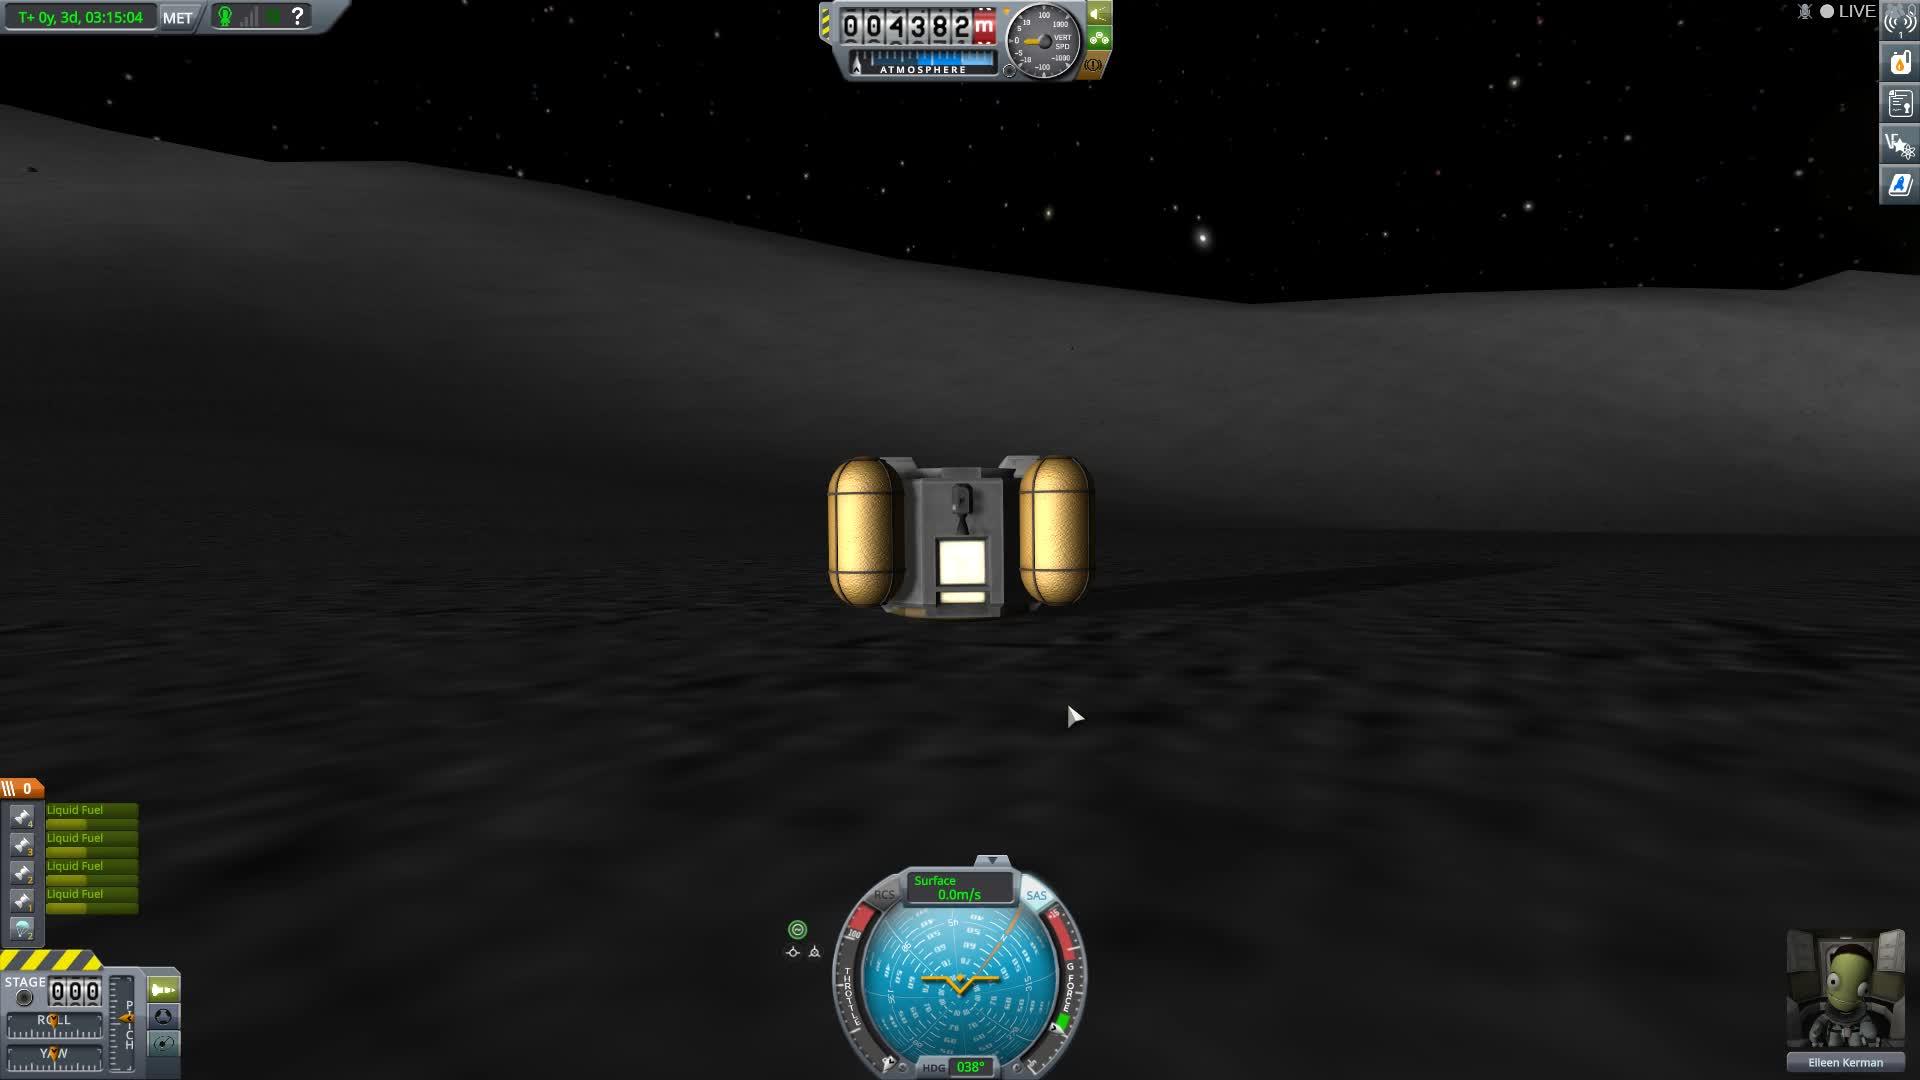 planetside2, uh GIFs